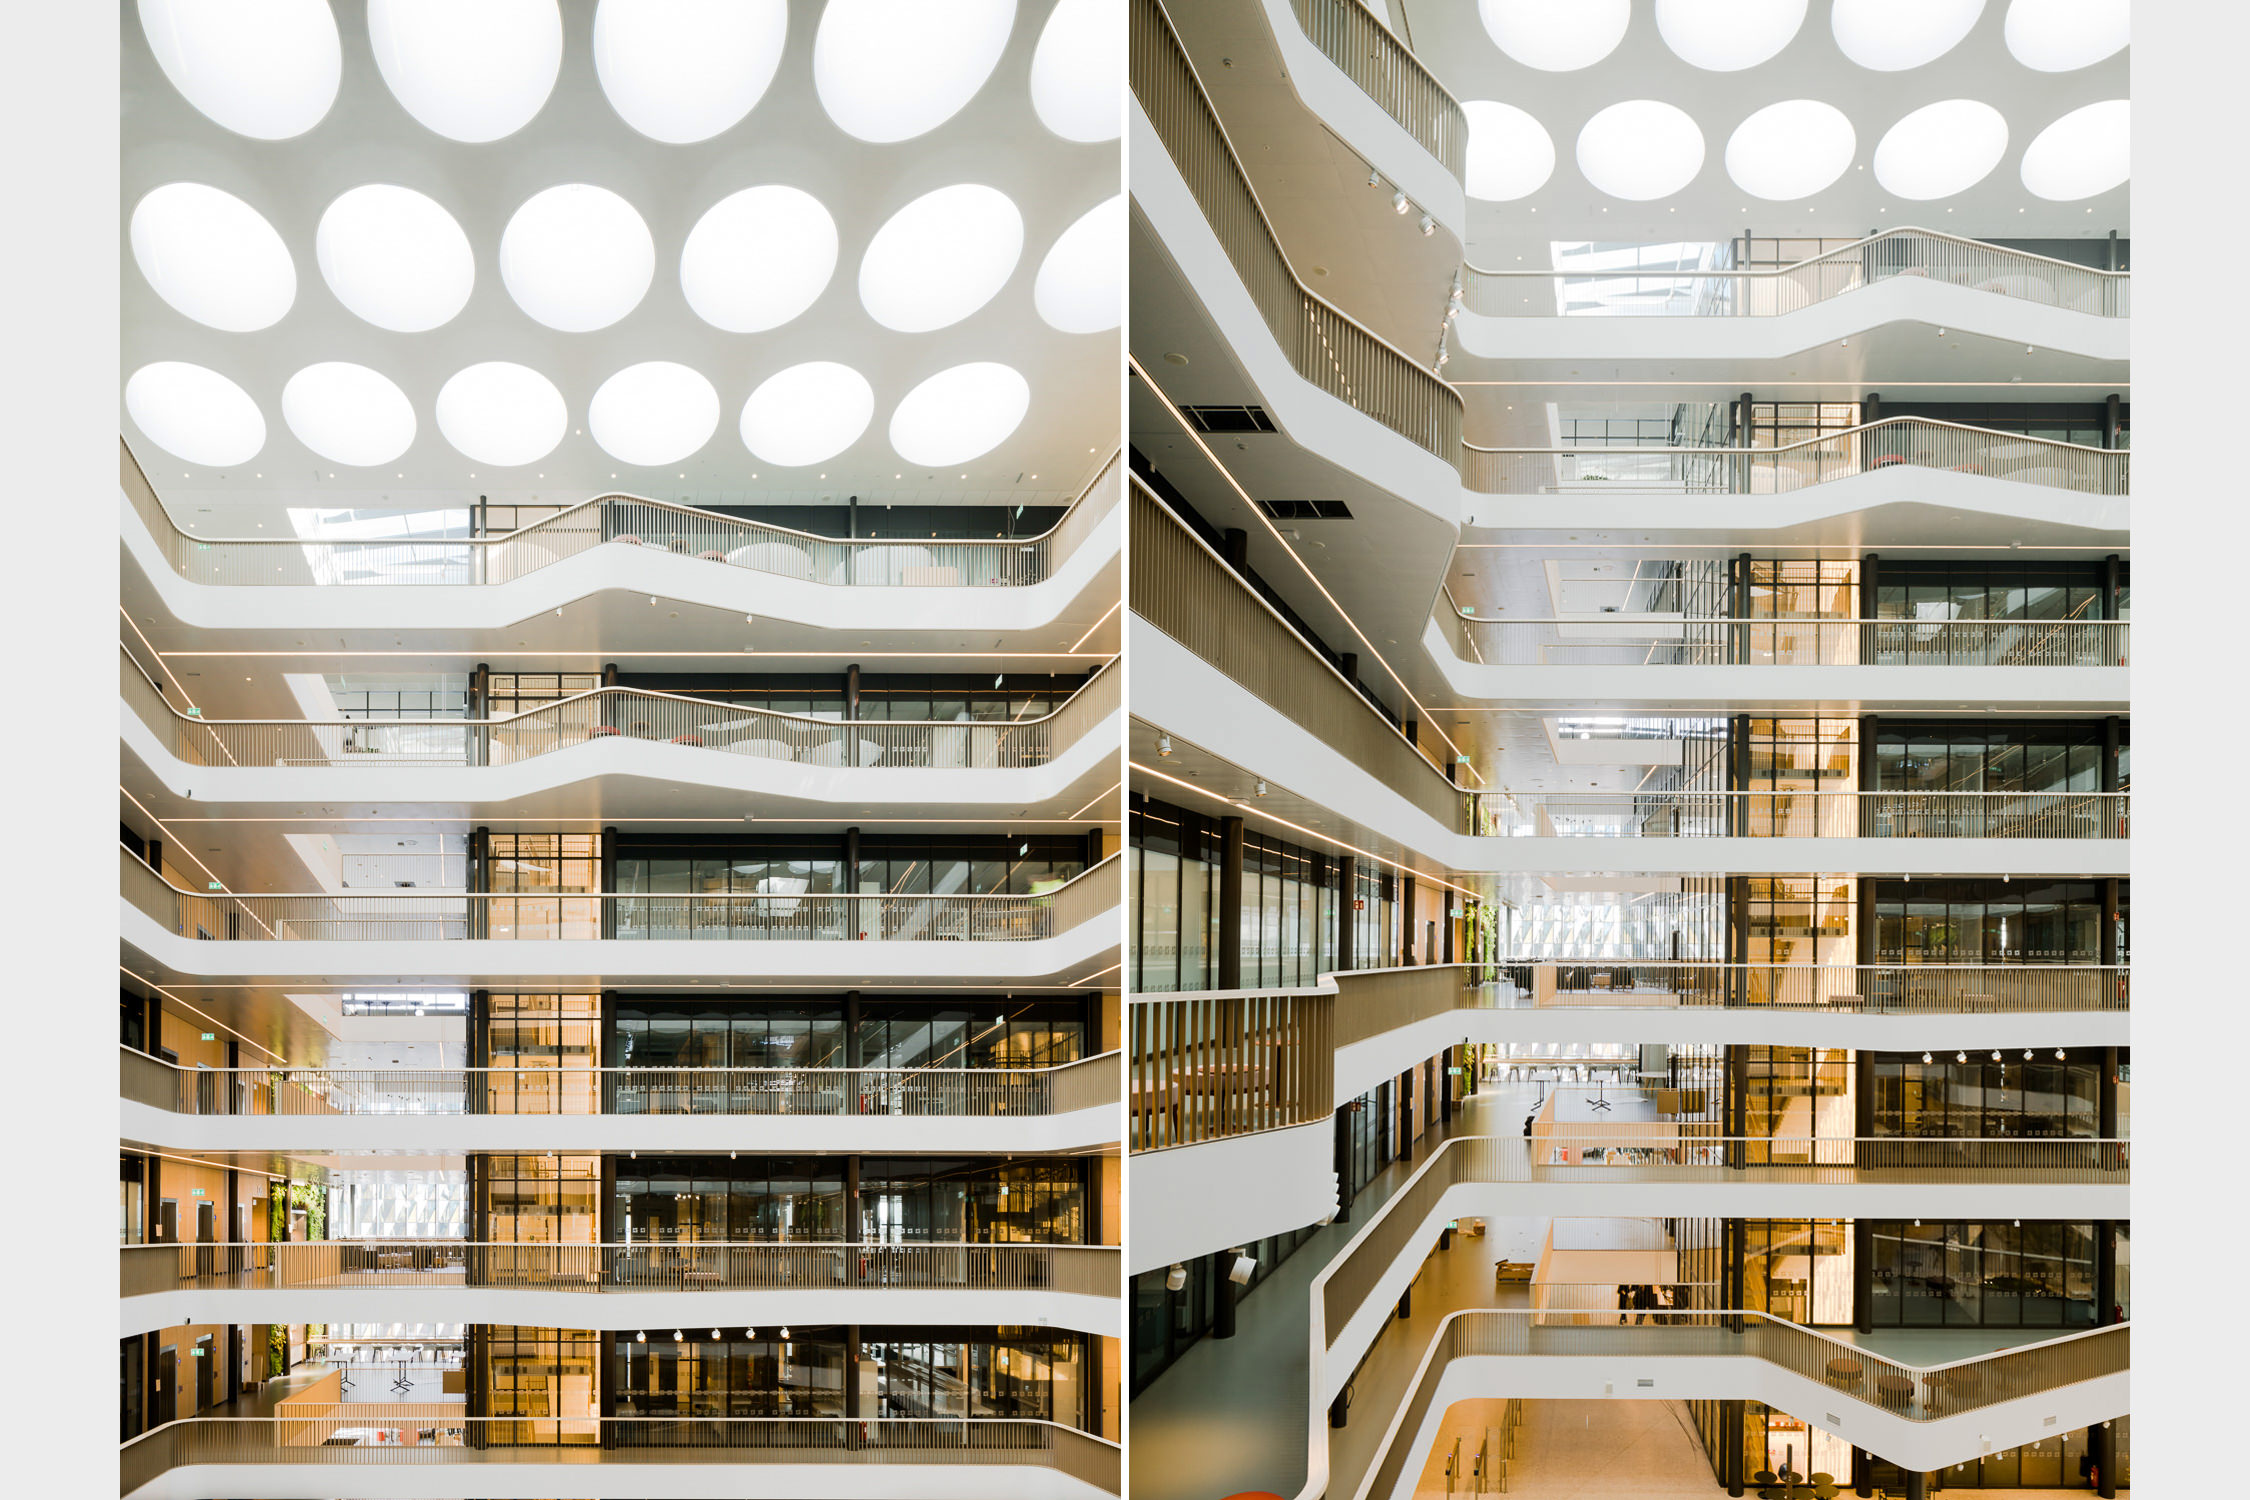 mark-hadden-architecture-photographer-london-amsterdam-Biomedicum-266 copy.jpg